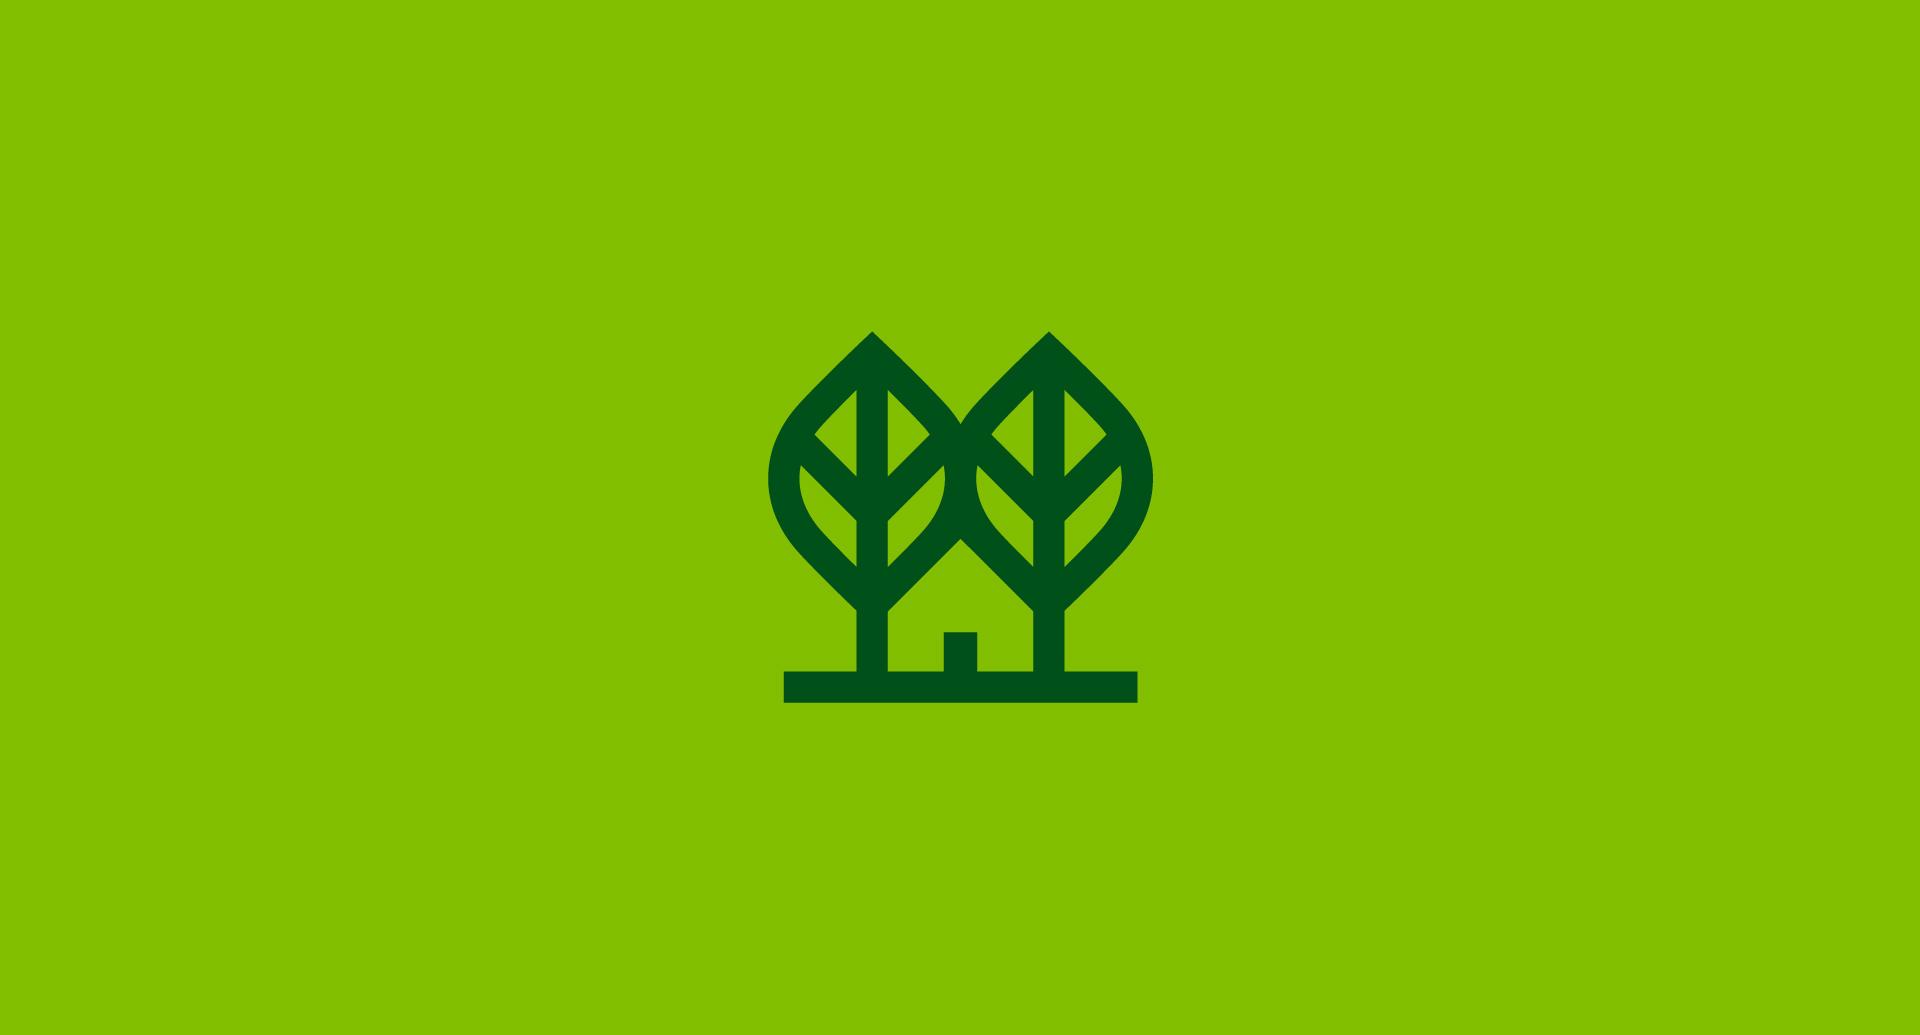 Symbol_on_light_green_1920_q80_01